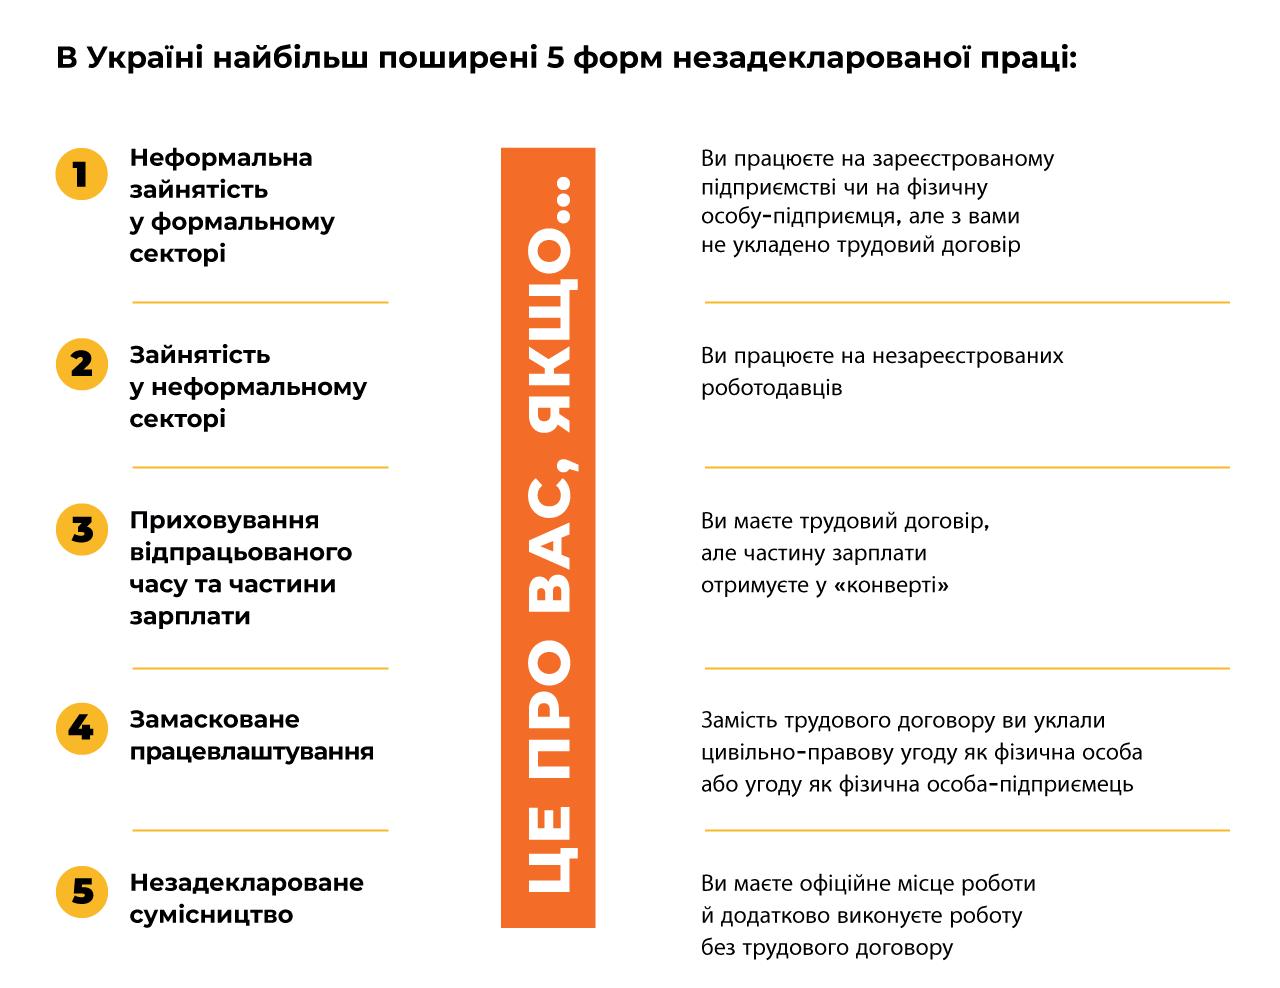 http://zt-rada.gov.ua/files/upload/all/2020/%D0%9D%D0%BE%D0%B2%D0%B8%D0%BD%D0%B8/ilo_infographic1_1_ukr-e1579623588986.png